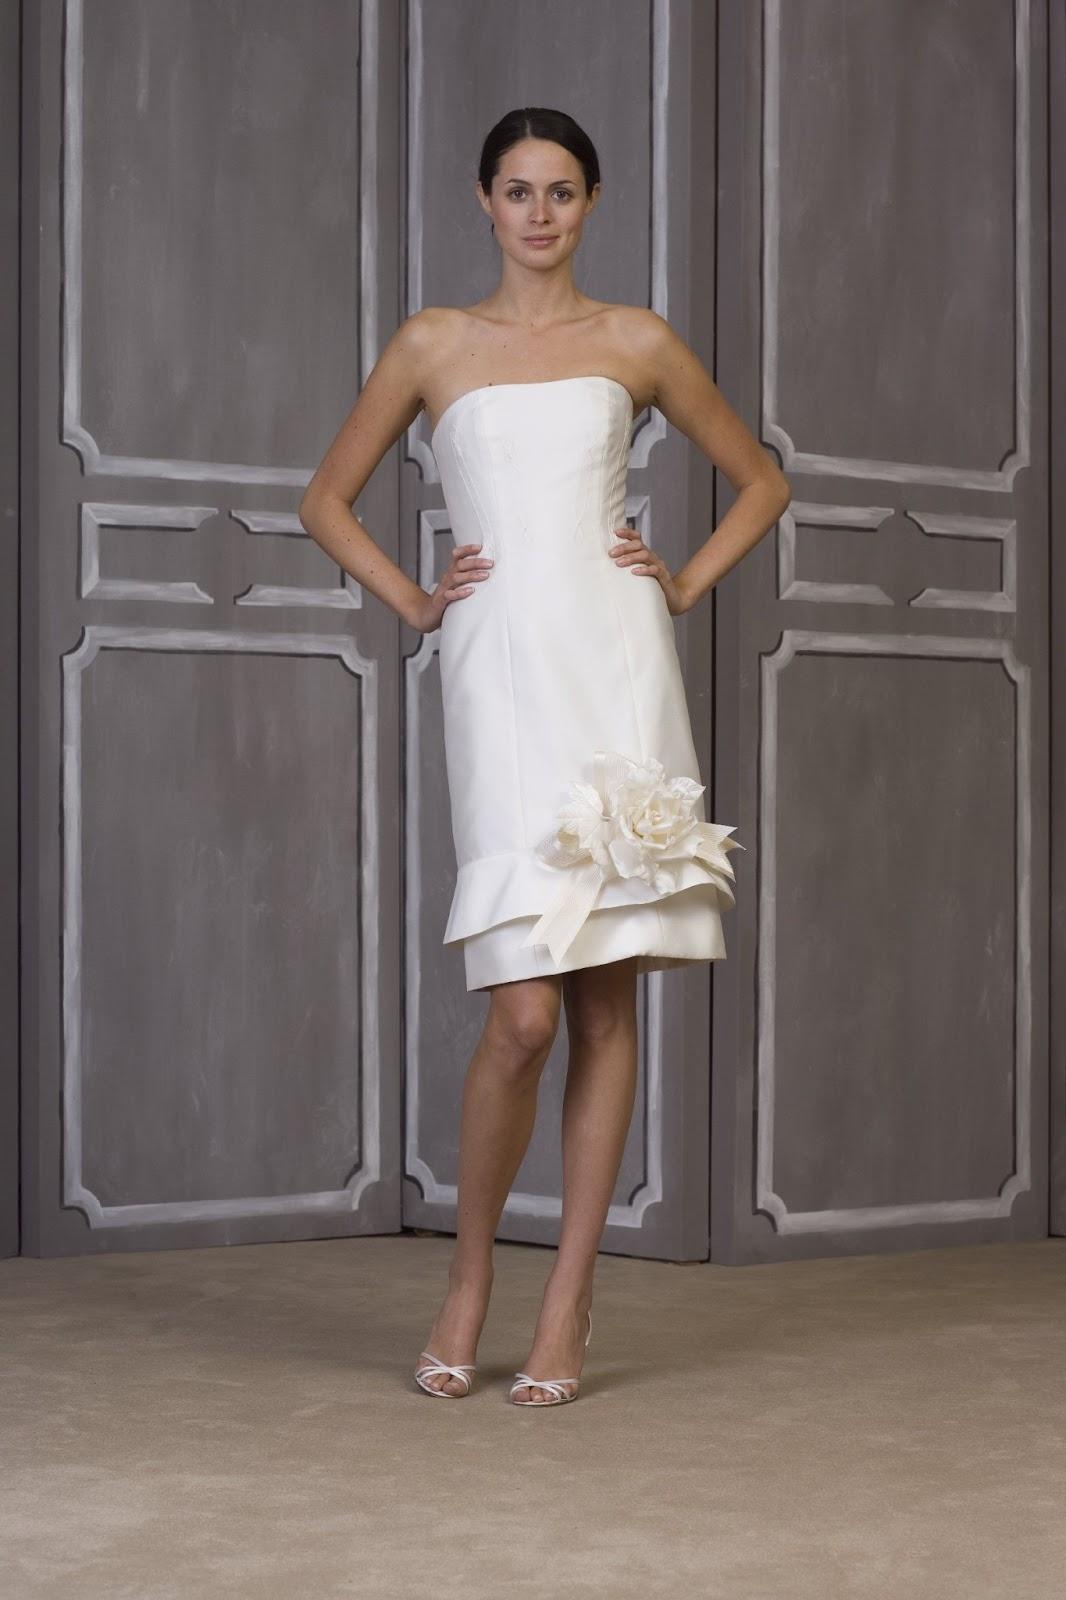 DressyBridal 5 Cute Short Wedding Dresses for Summer Casual Weddings